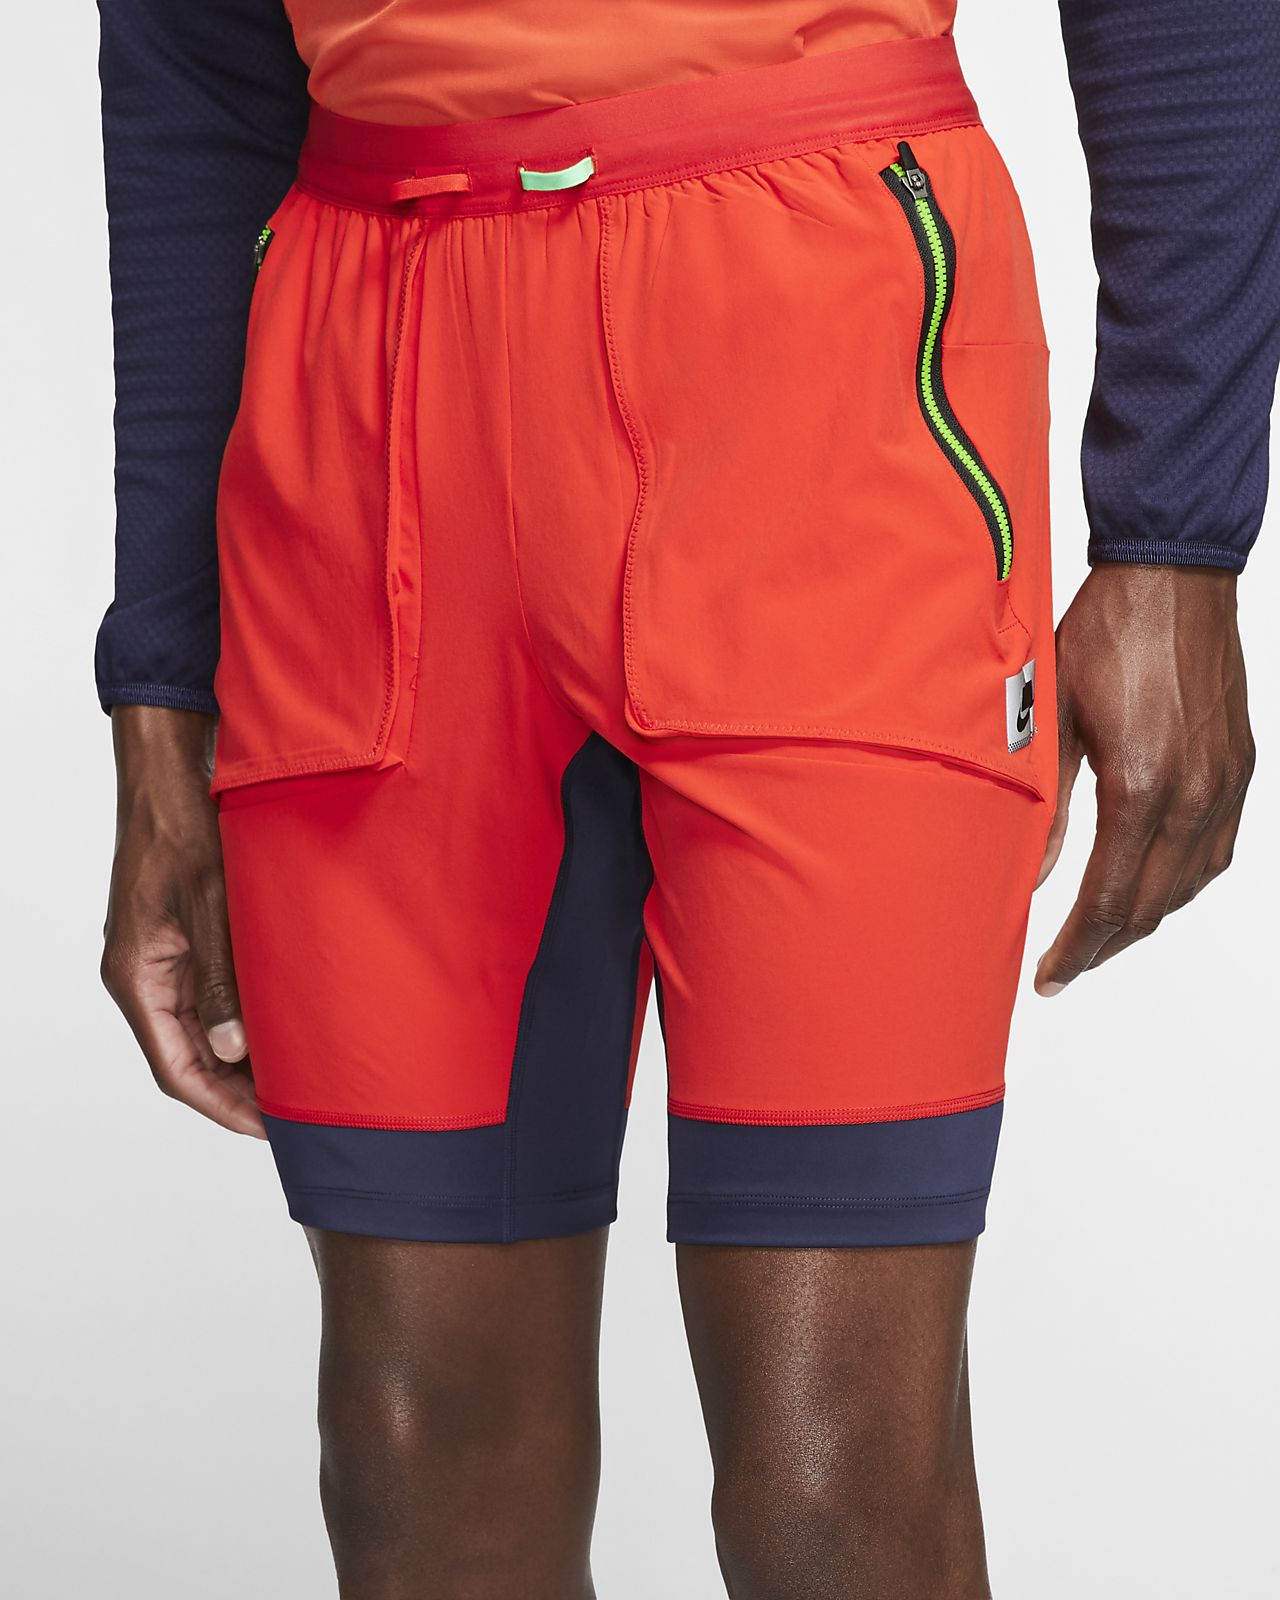 Nike Wild Run Men's Hybrid Running Shorts